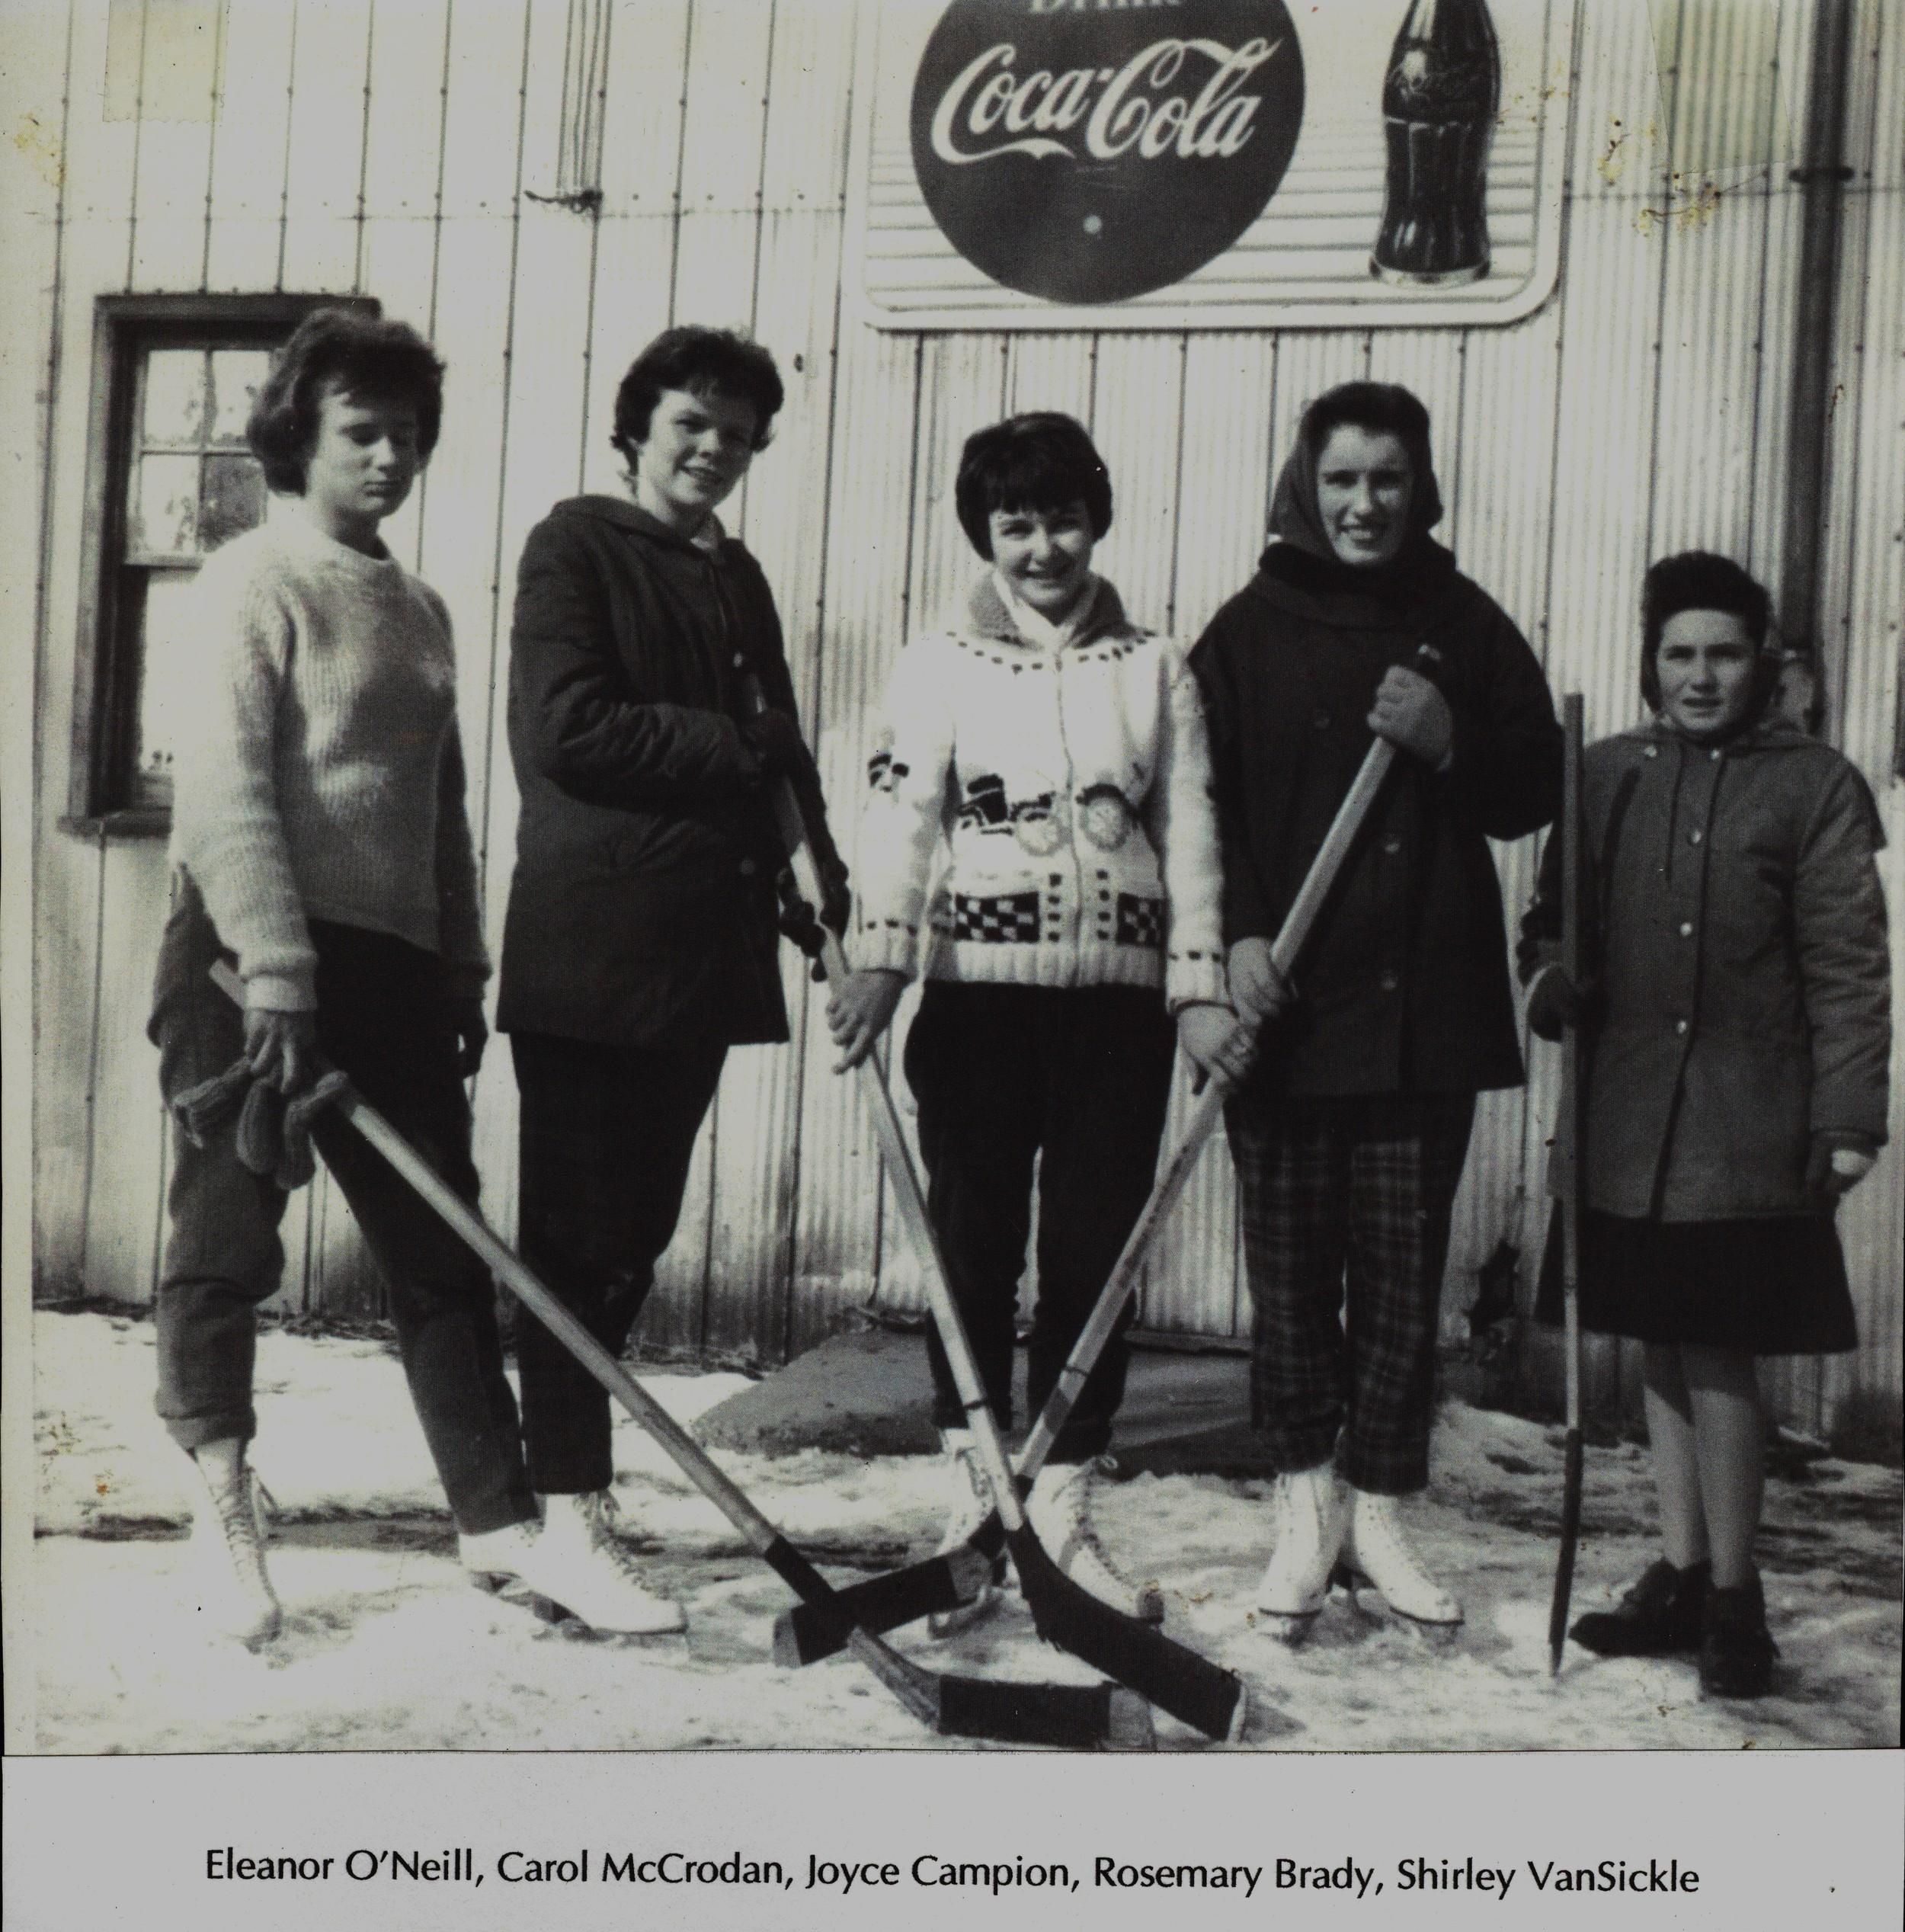 Eleanor O'Neill, Carol McCrodan,  Joyce Campion,  Rosemary Brady, Shirley Vansickle.jpg